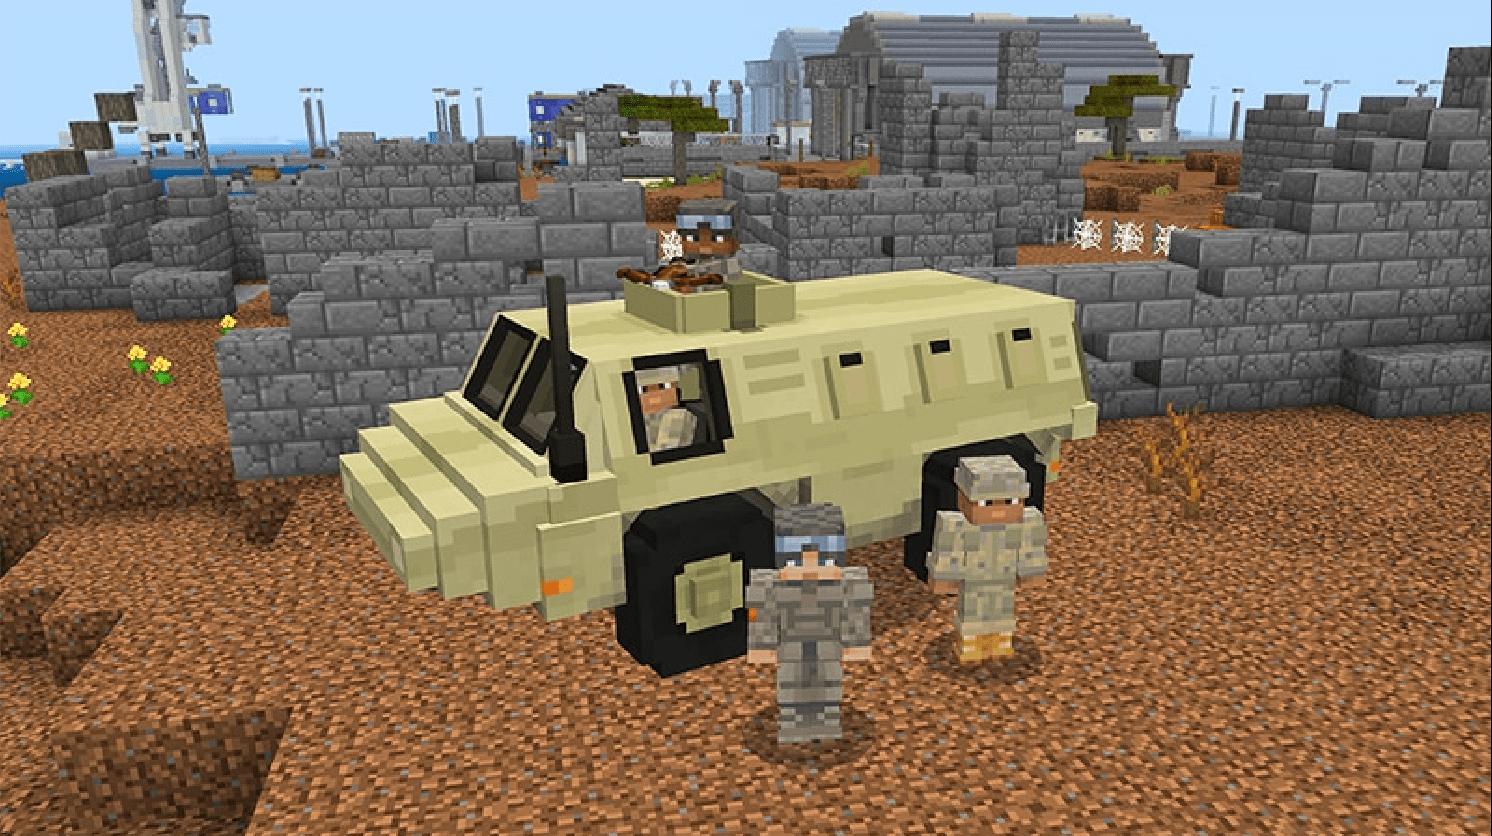 3. Military Base